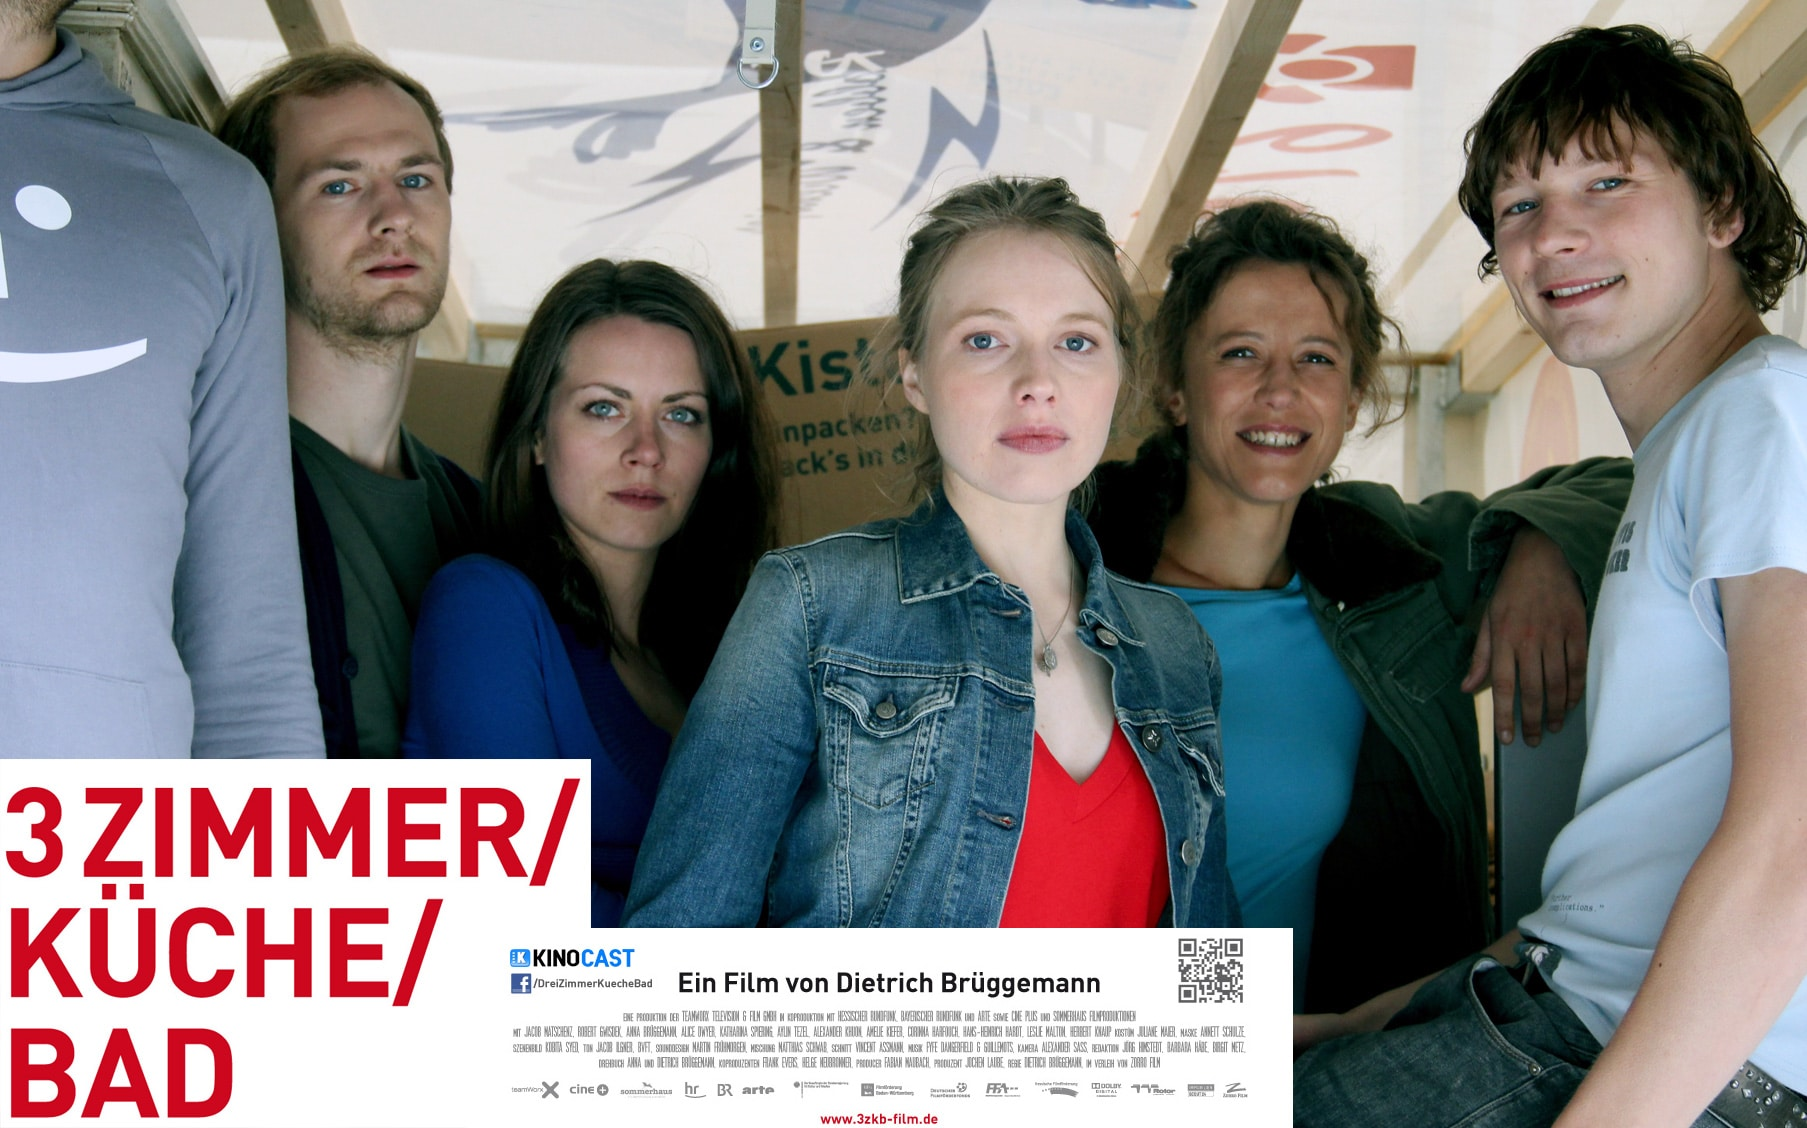 Toll 3_zimmer_kueche_bad_film_poster